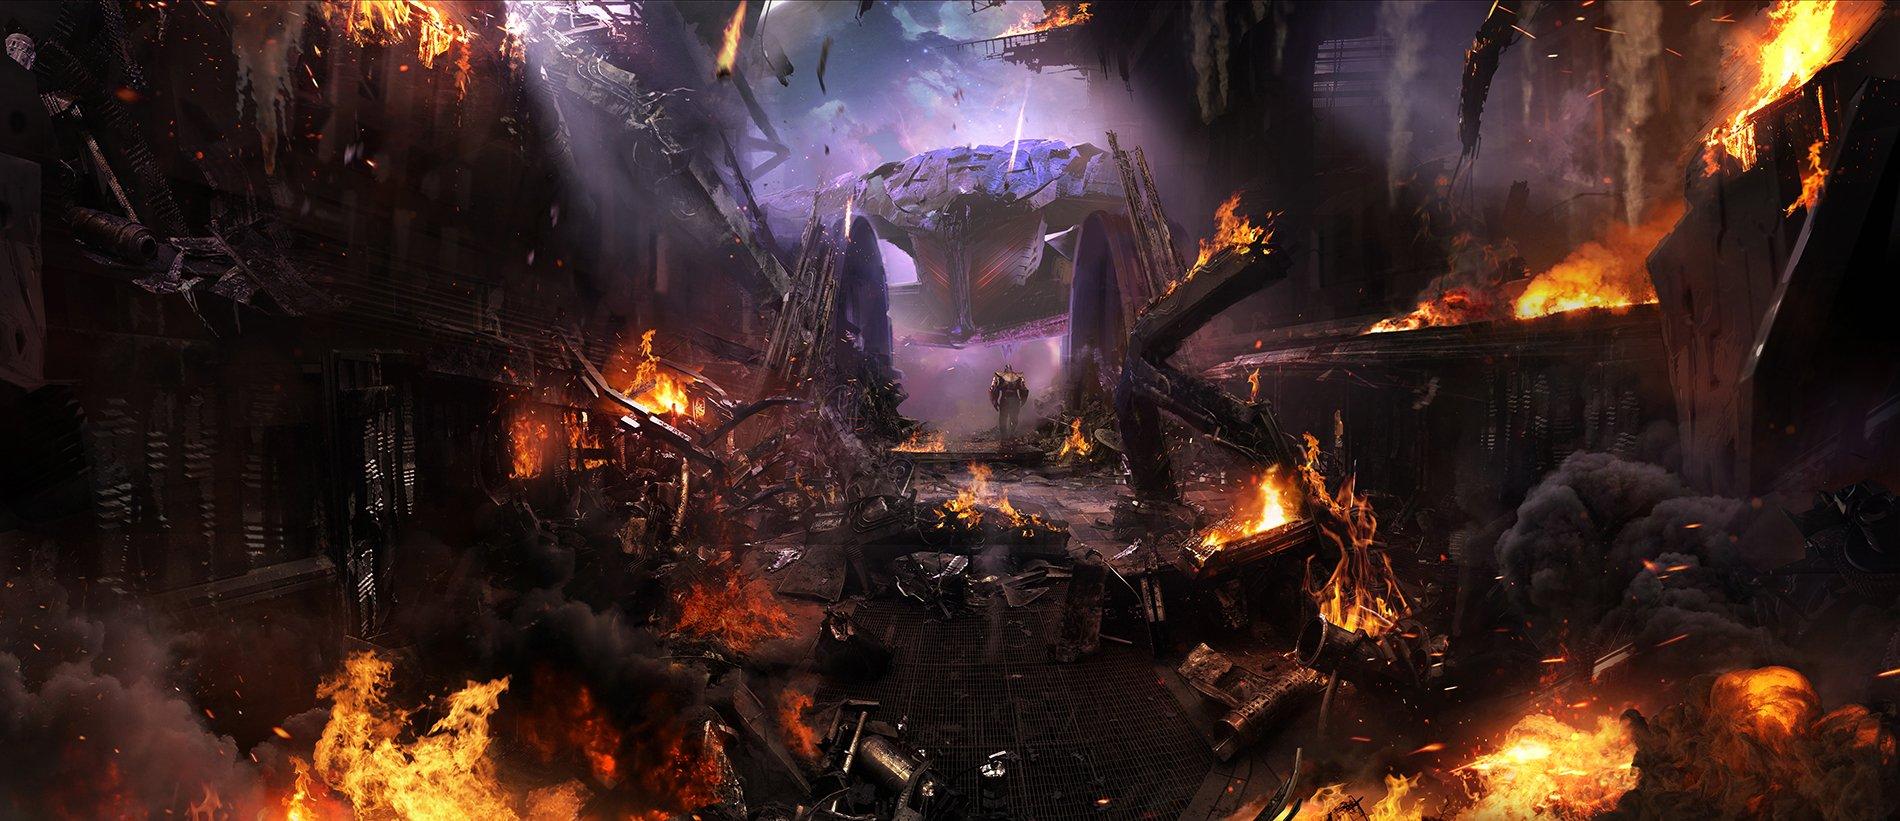 Концепт-арт Войны Бесконечности: Ark destruction by Pete Thompson